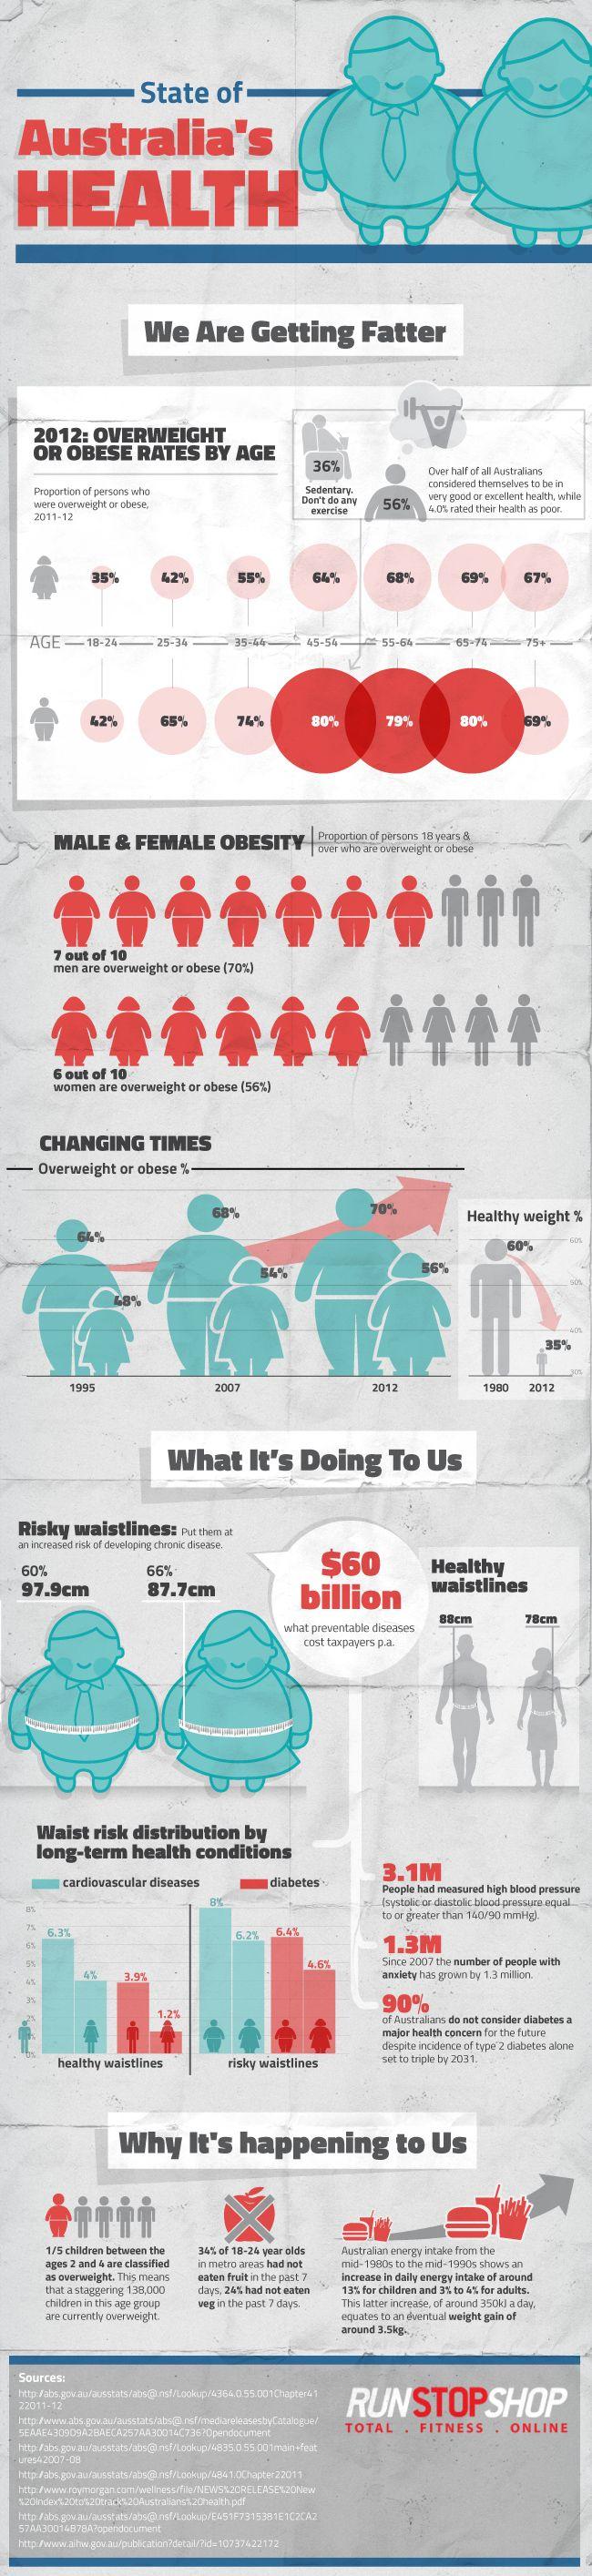 State Of Australia's Health Infographic